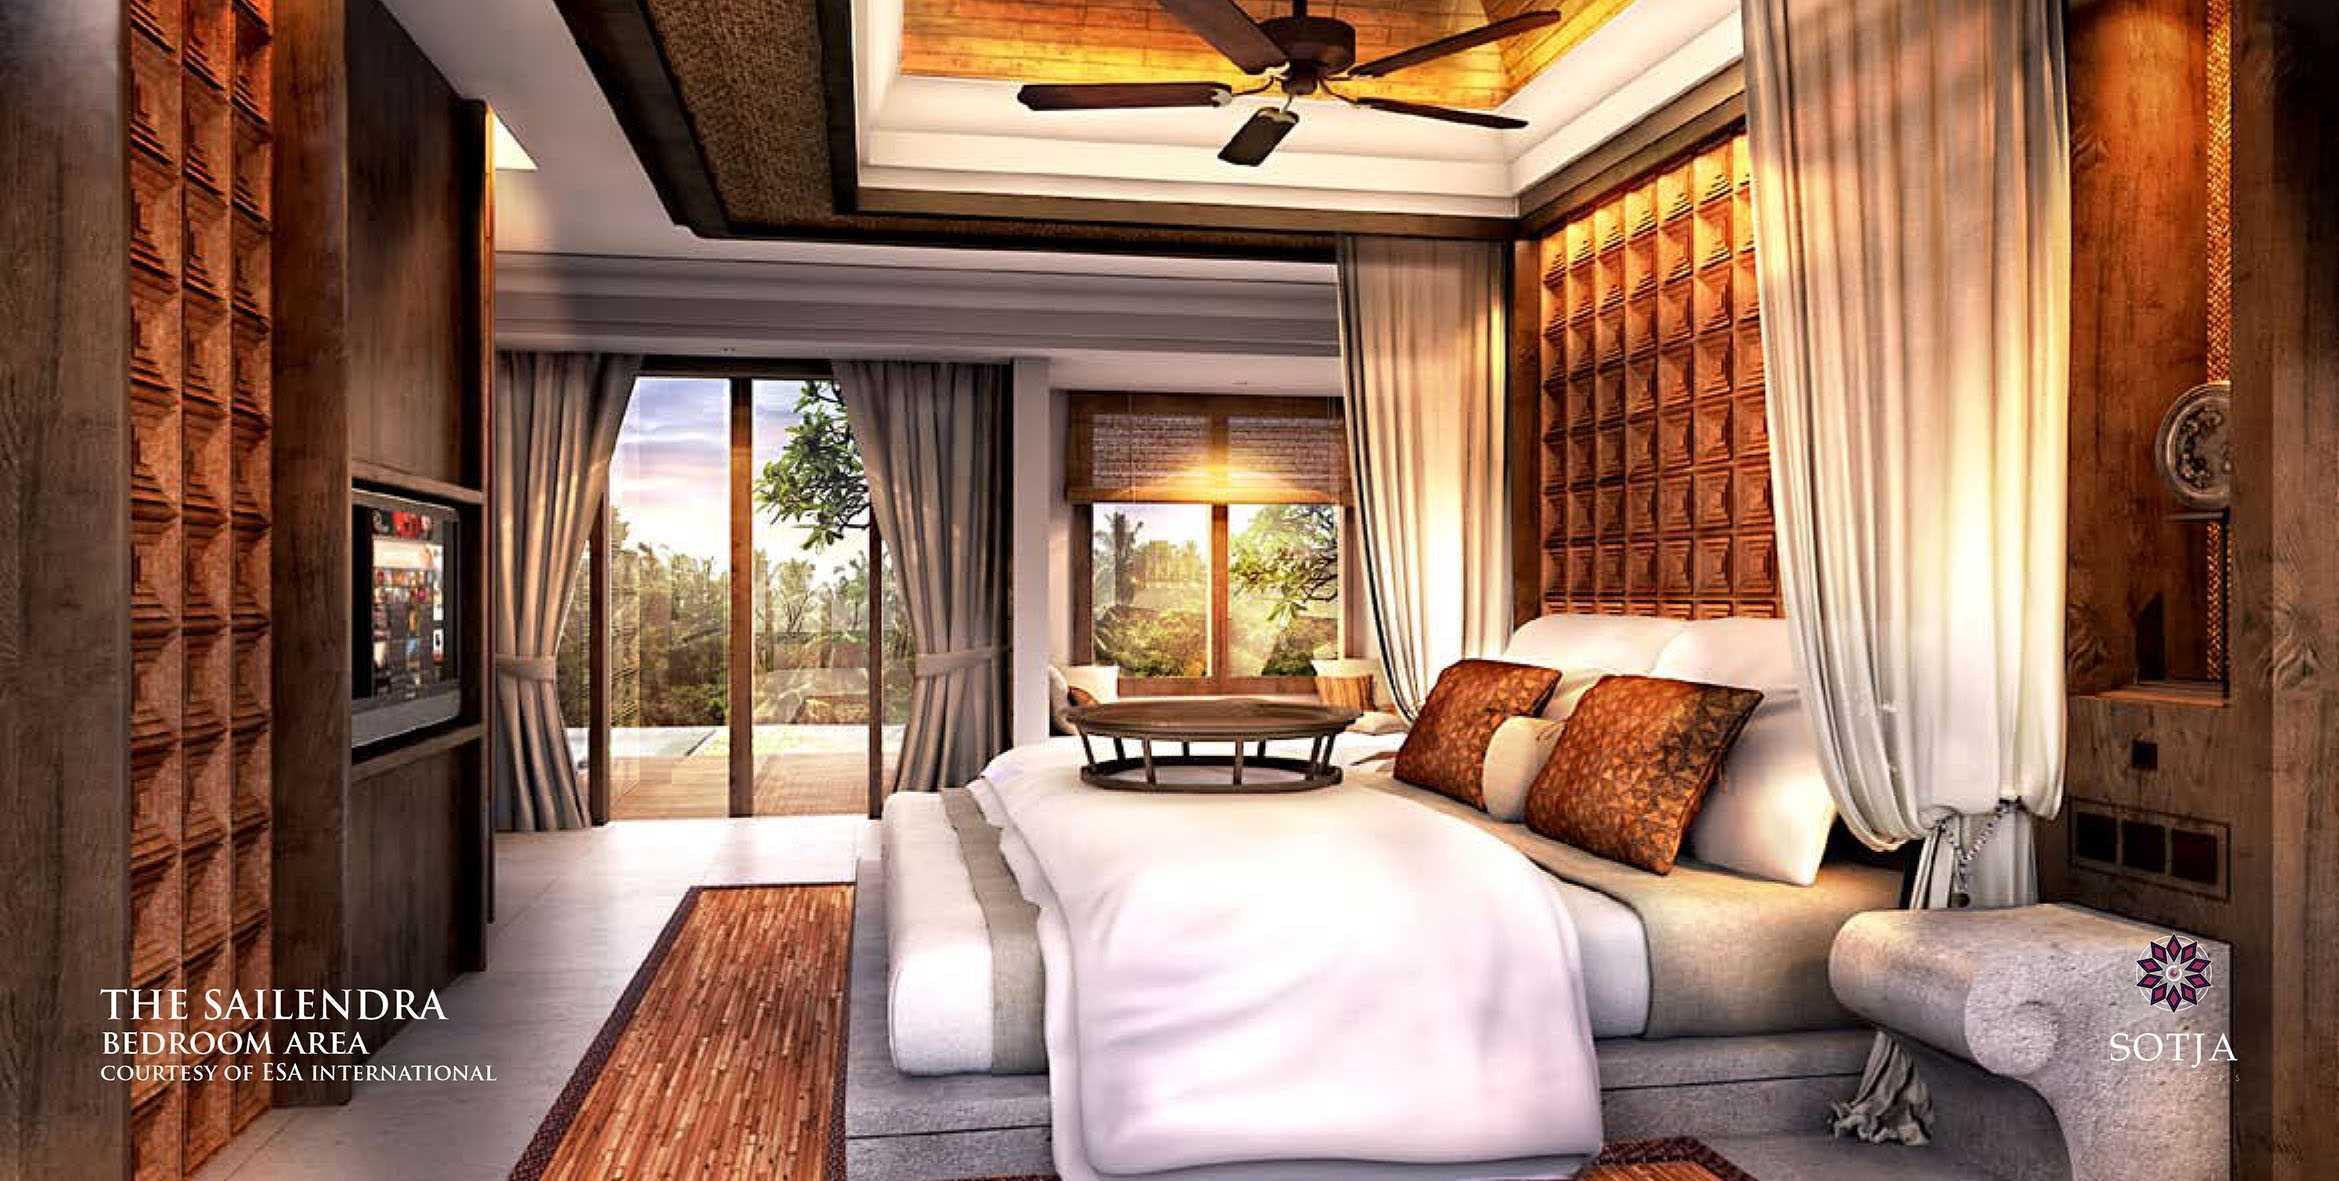 Sotja Interiors The Sailendra At Payangan Ubud Bali, Indonesia Bali, Indonesia Bedroom-Area   9952